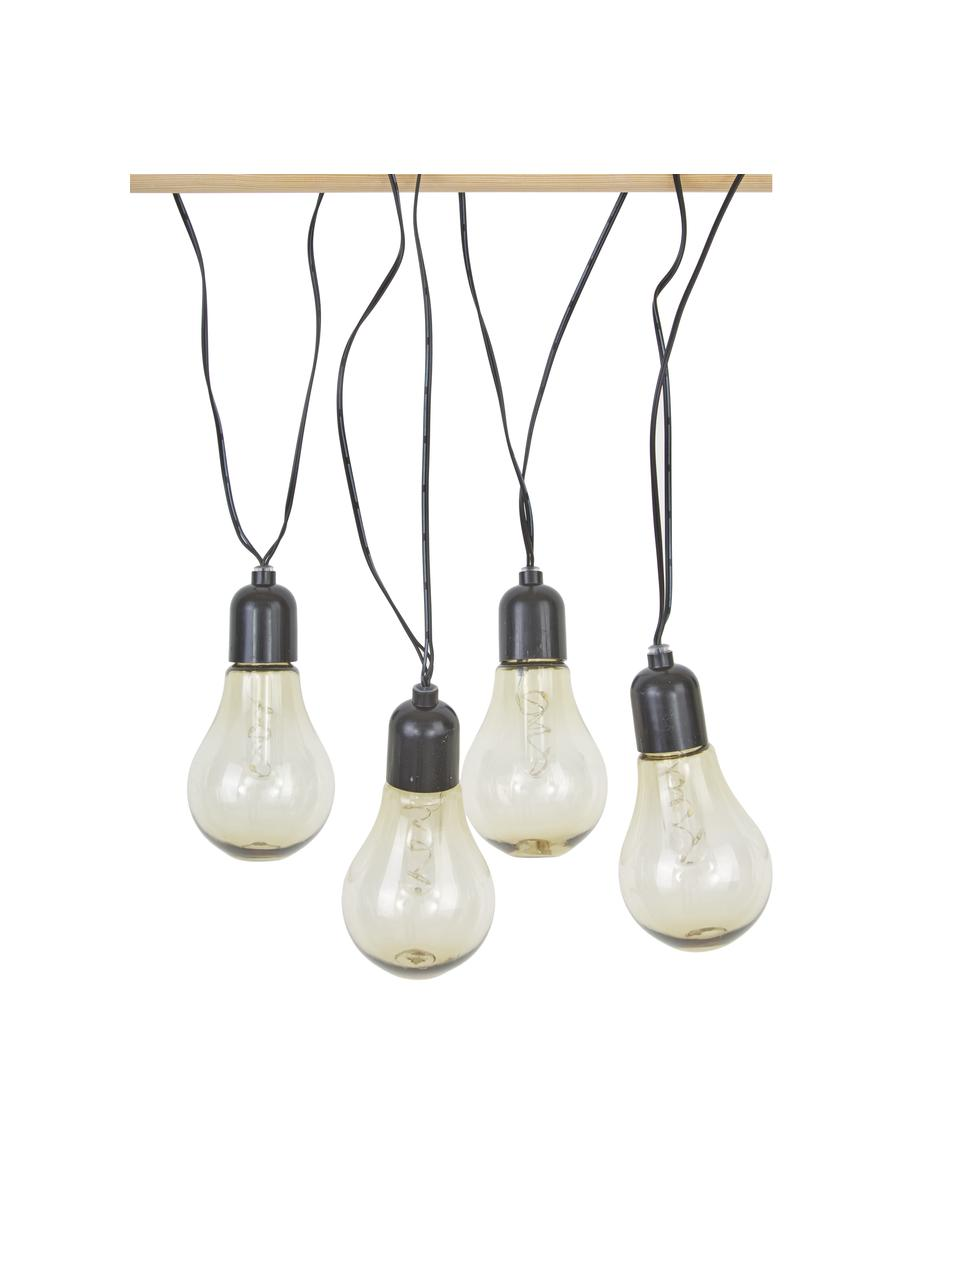 Ghirlanda a LED Glow, 505 cm, 10 lampioni, Trasparente, nero, Lung. 505 cm